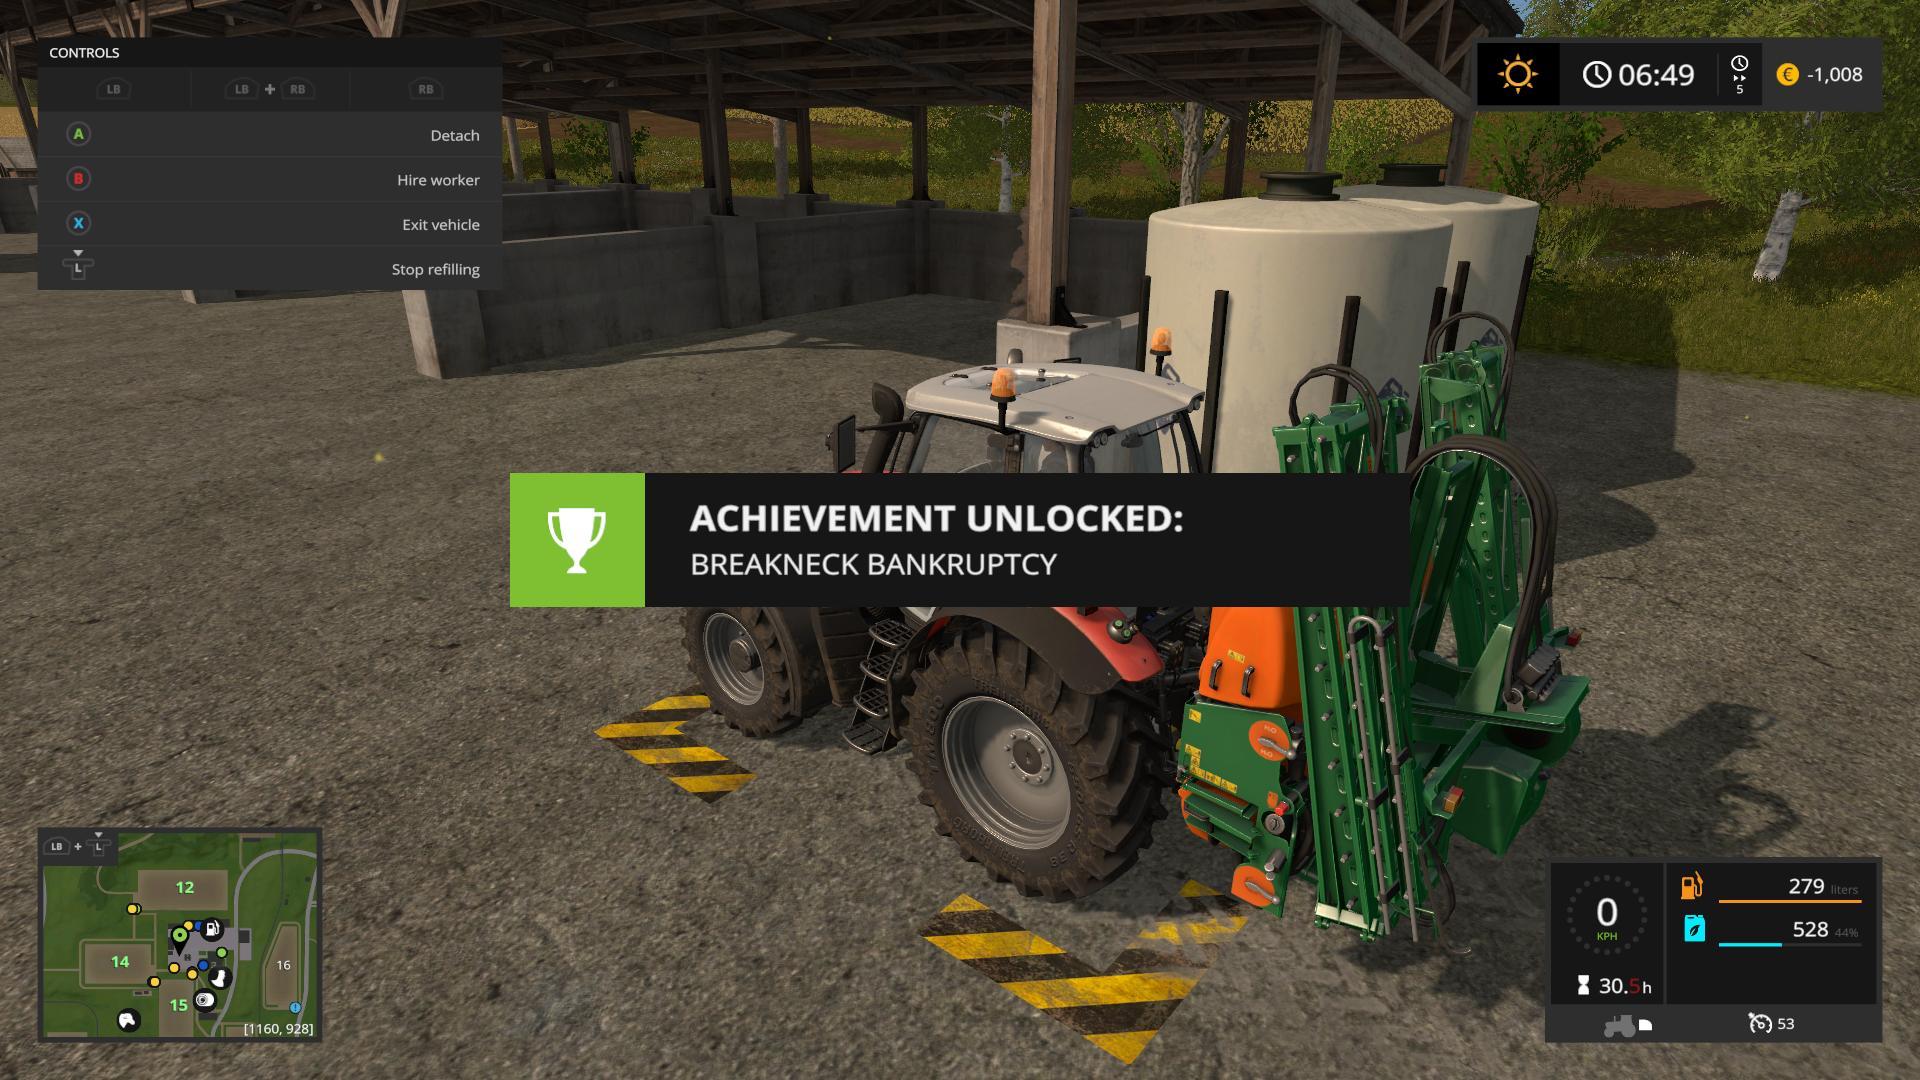 FS17 GOLD CREST EDIT BY STEVIE - Farming simulator 2019